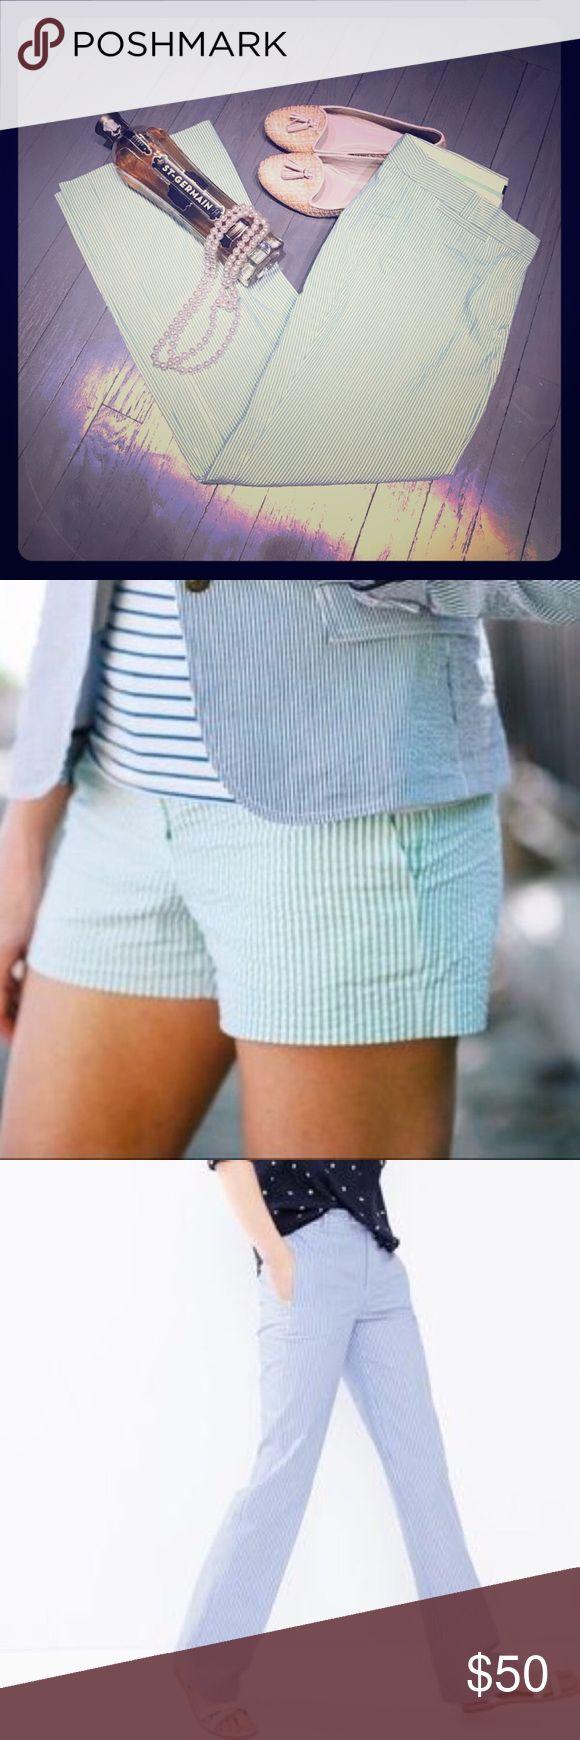 J Crew favorite fit green white seersucker pants J. Crew favorite fit green white seersucker straight leg pants (green seersucker 5yr boys shorts also for sale in another listing) J. Crew Pants Straight Leg